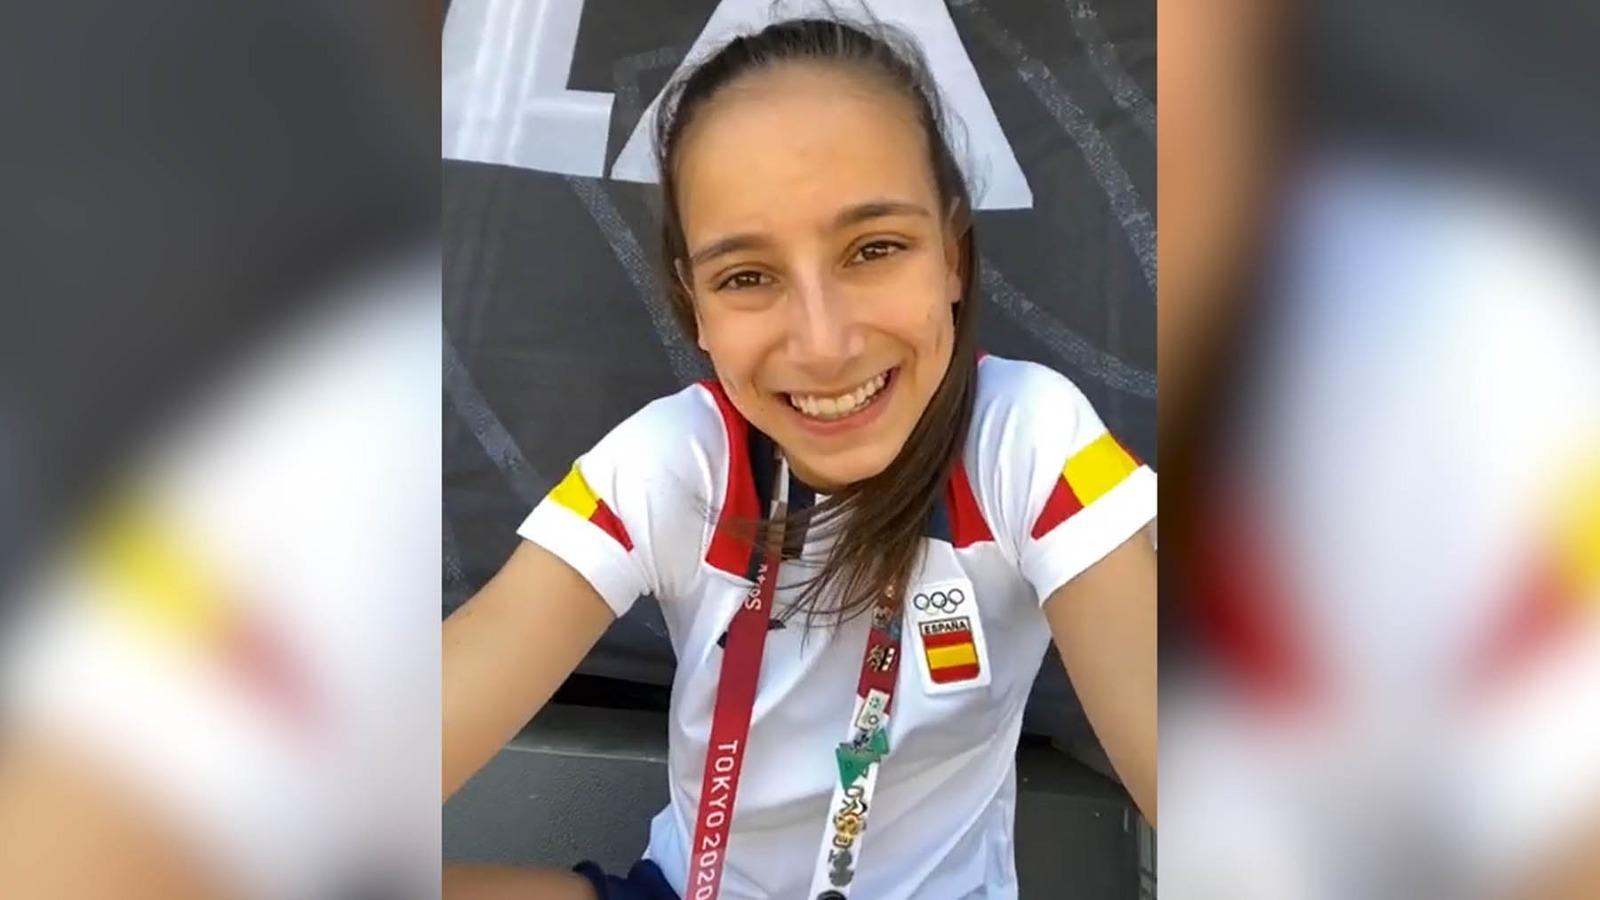 Adriana Cerezo habla con OKDIARIO tras su medalla de plata.